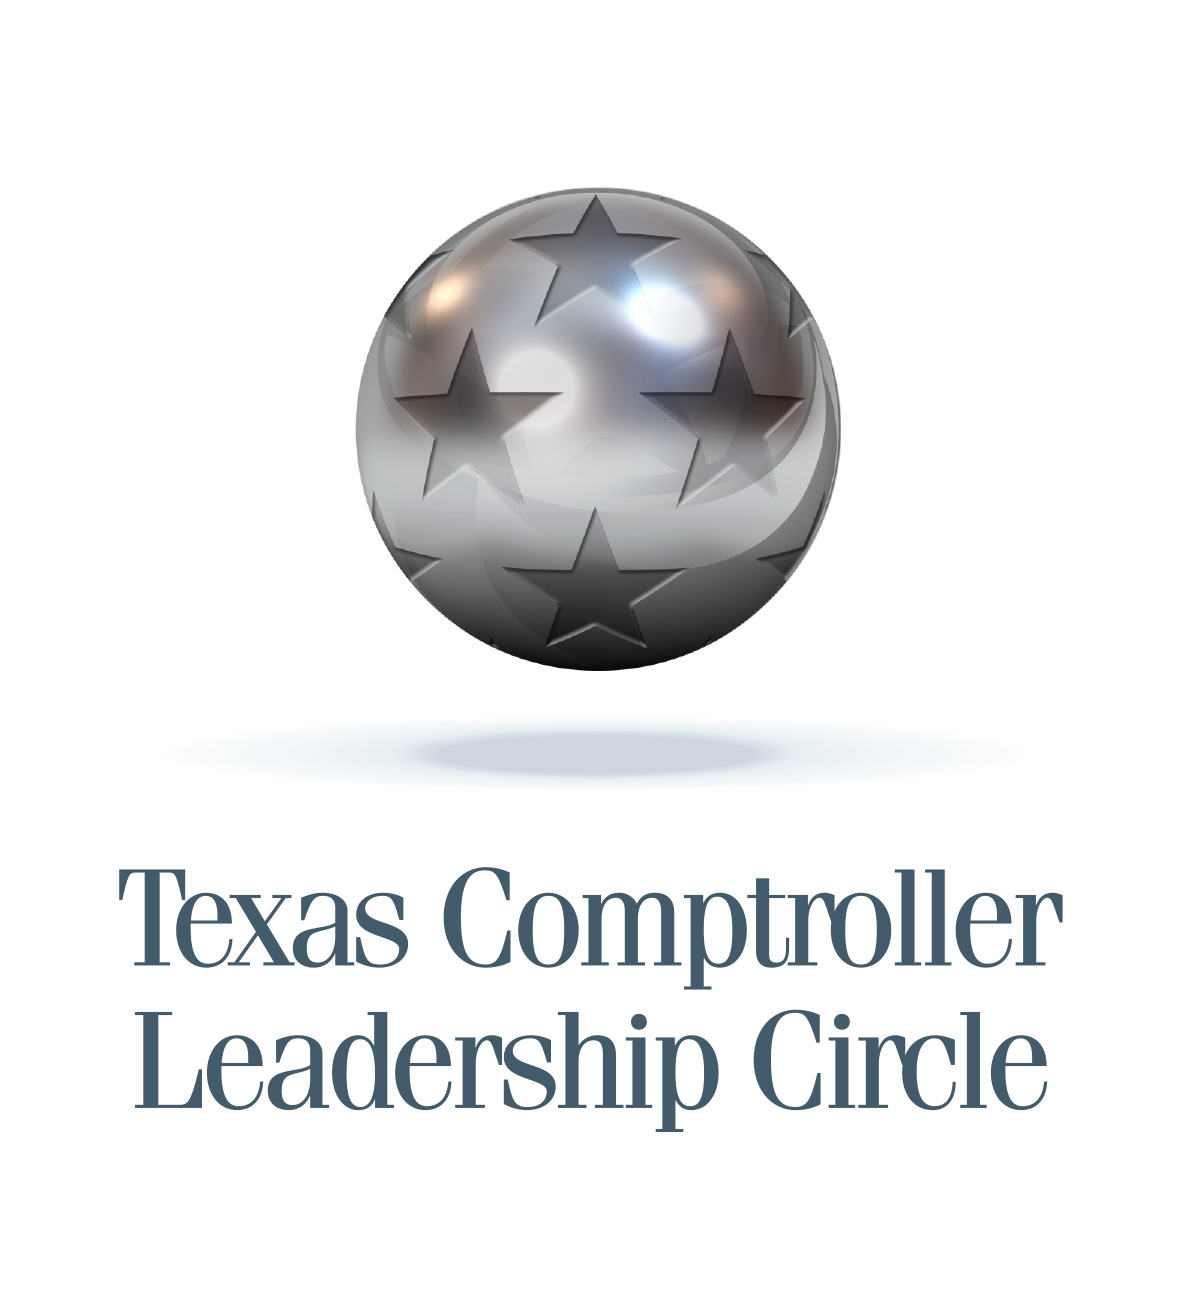 Texas Comptroller Leadership Circle Award. A plantinum colored ball with stars.